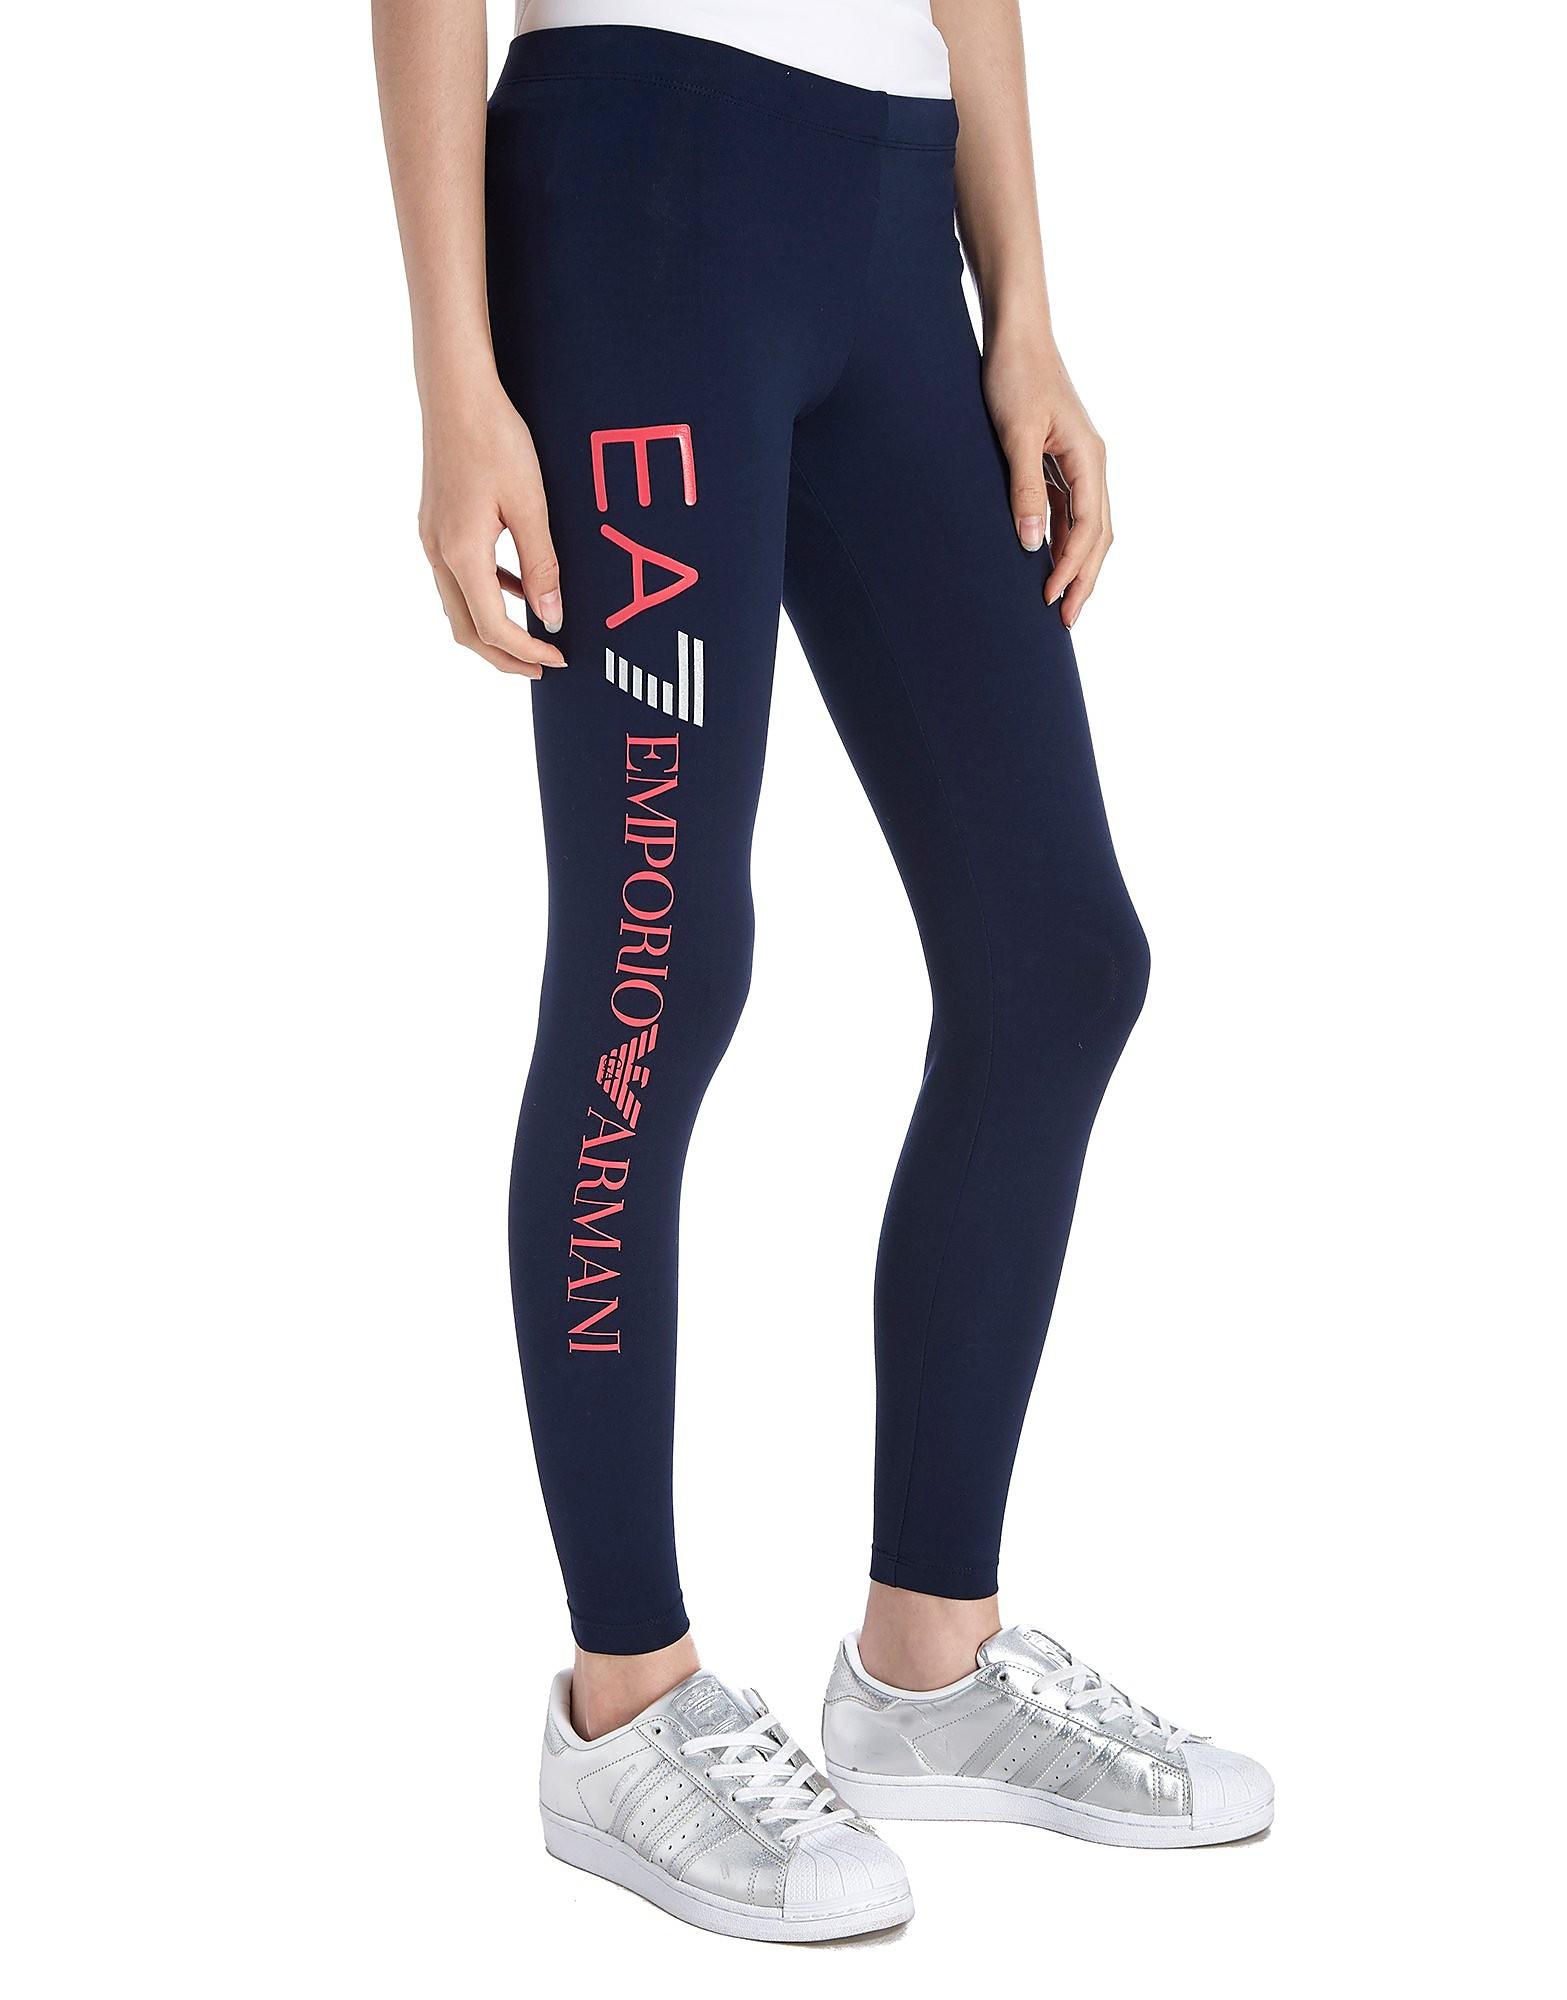 Emporio Armani EA7 Girls' Gloss Leggings Junior